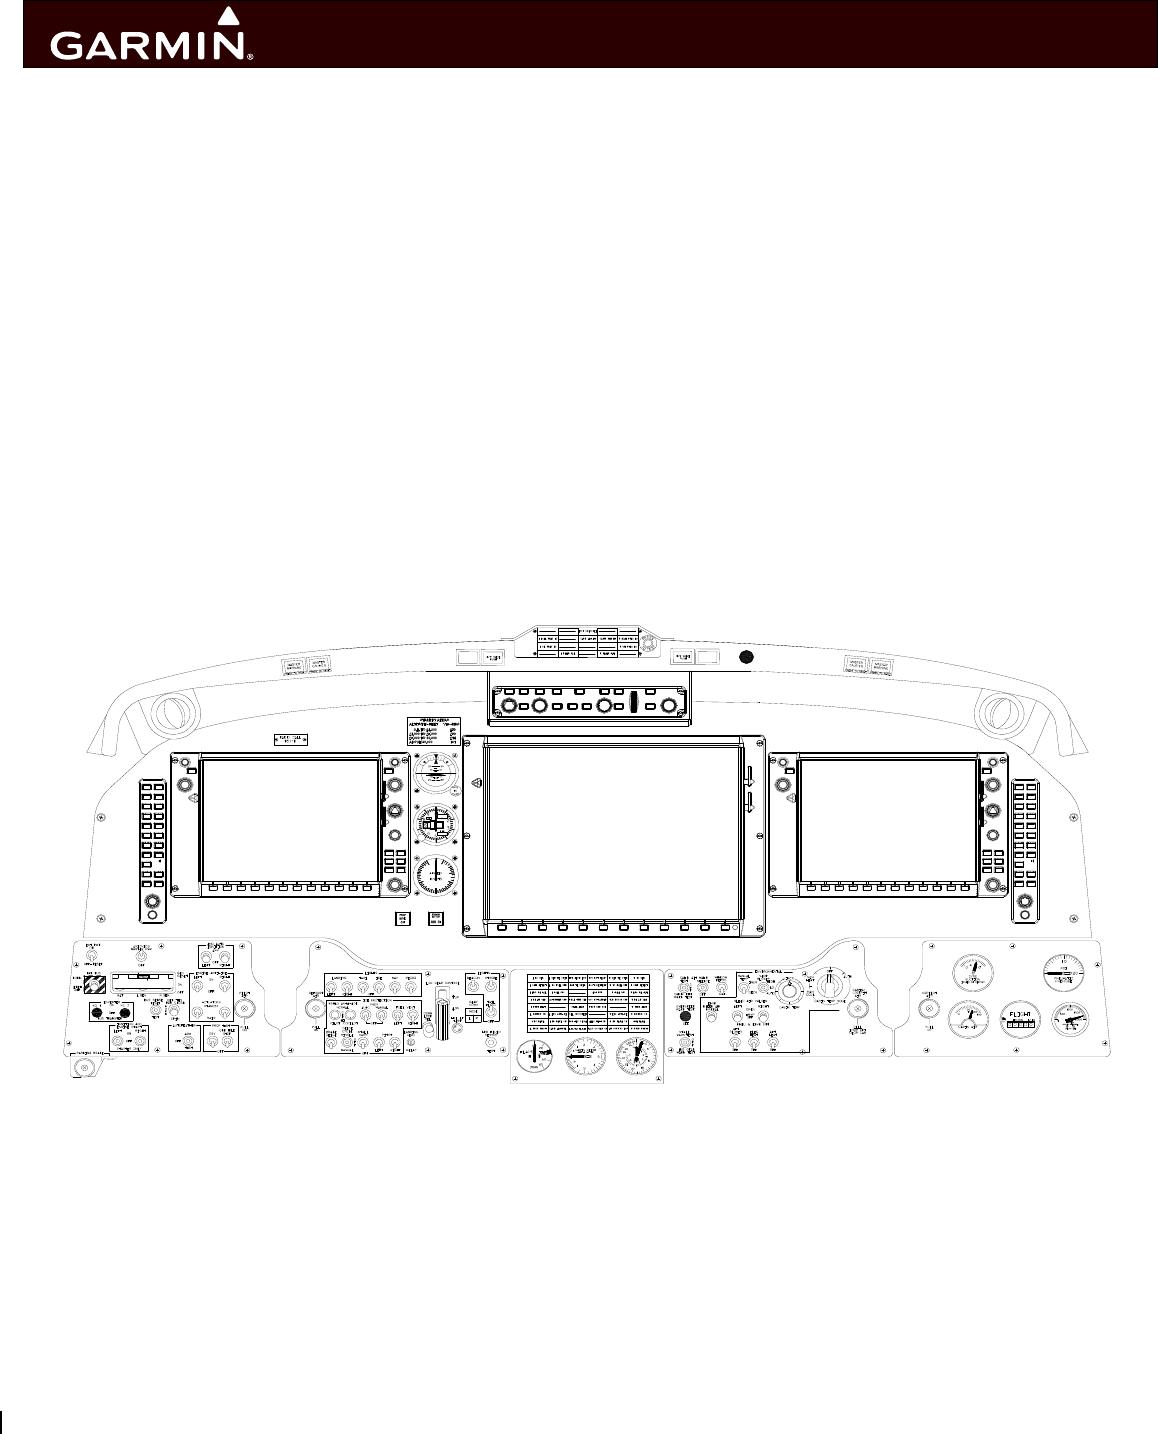 Garmin Mdl Rev 7 Sa01535wi D Instruction Manual 190 00716 01 04x Gsd 20 Wiring Diagram